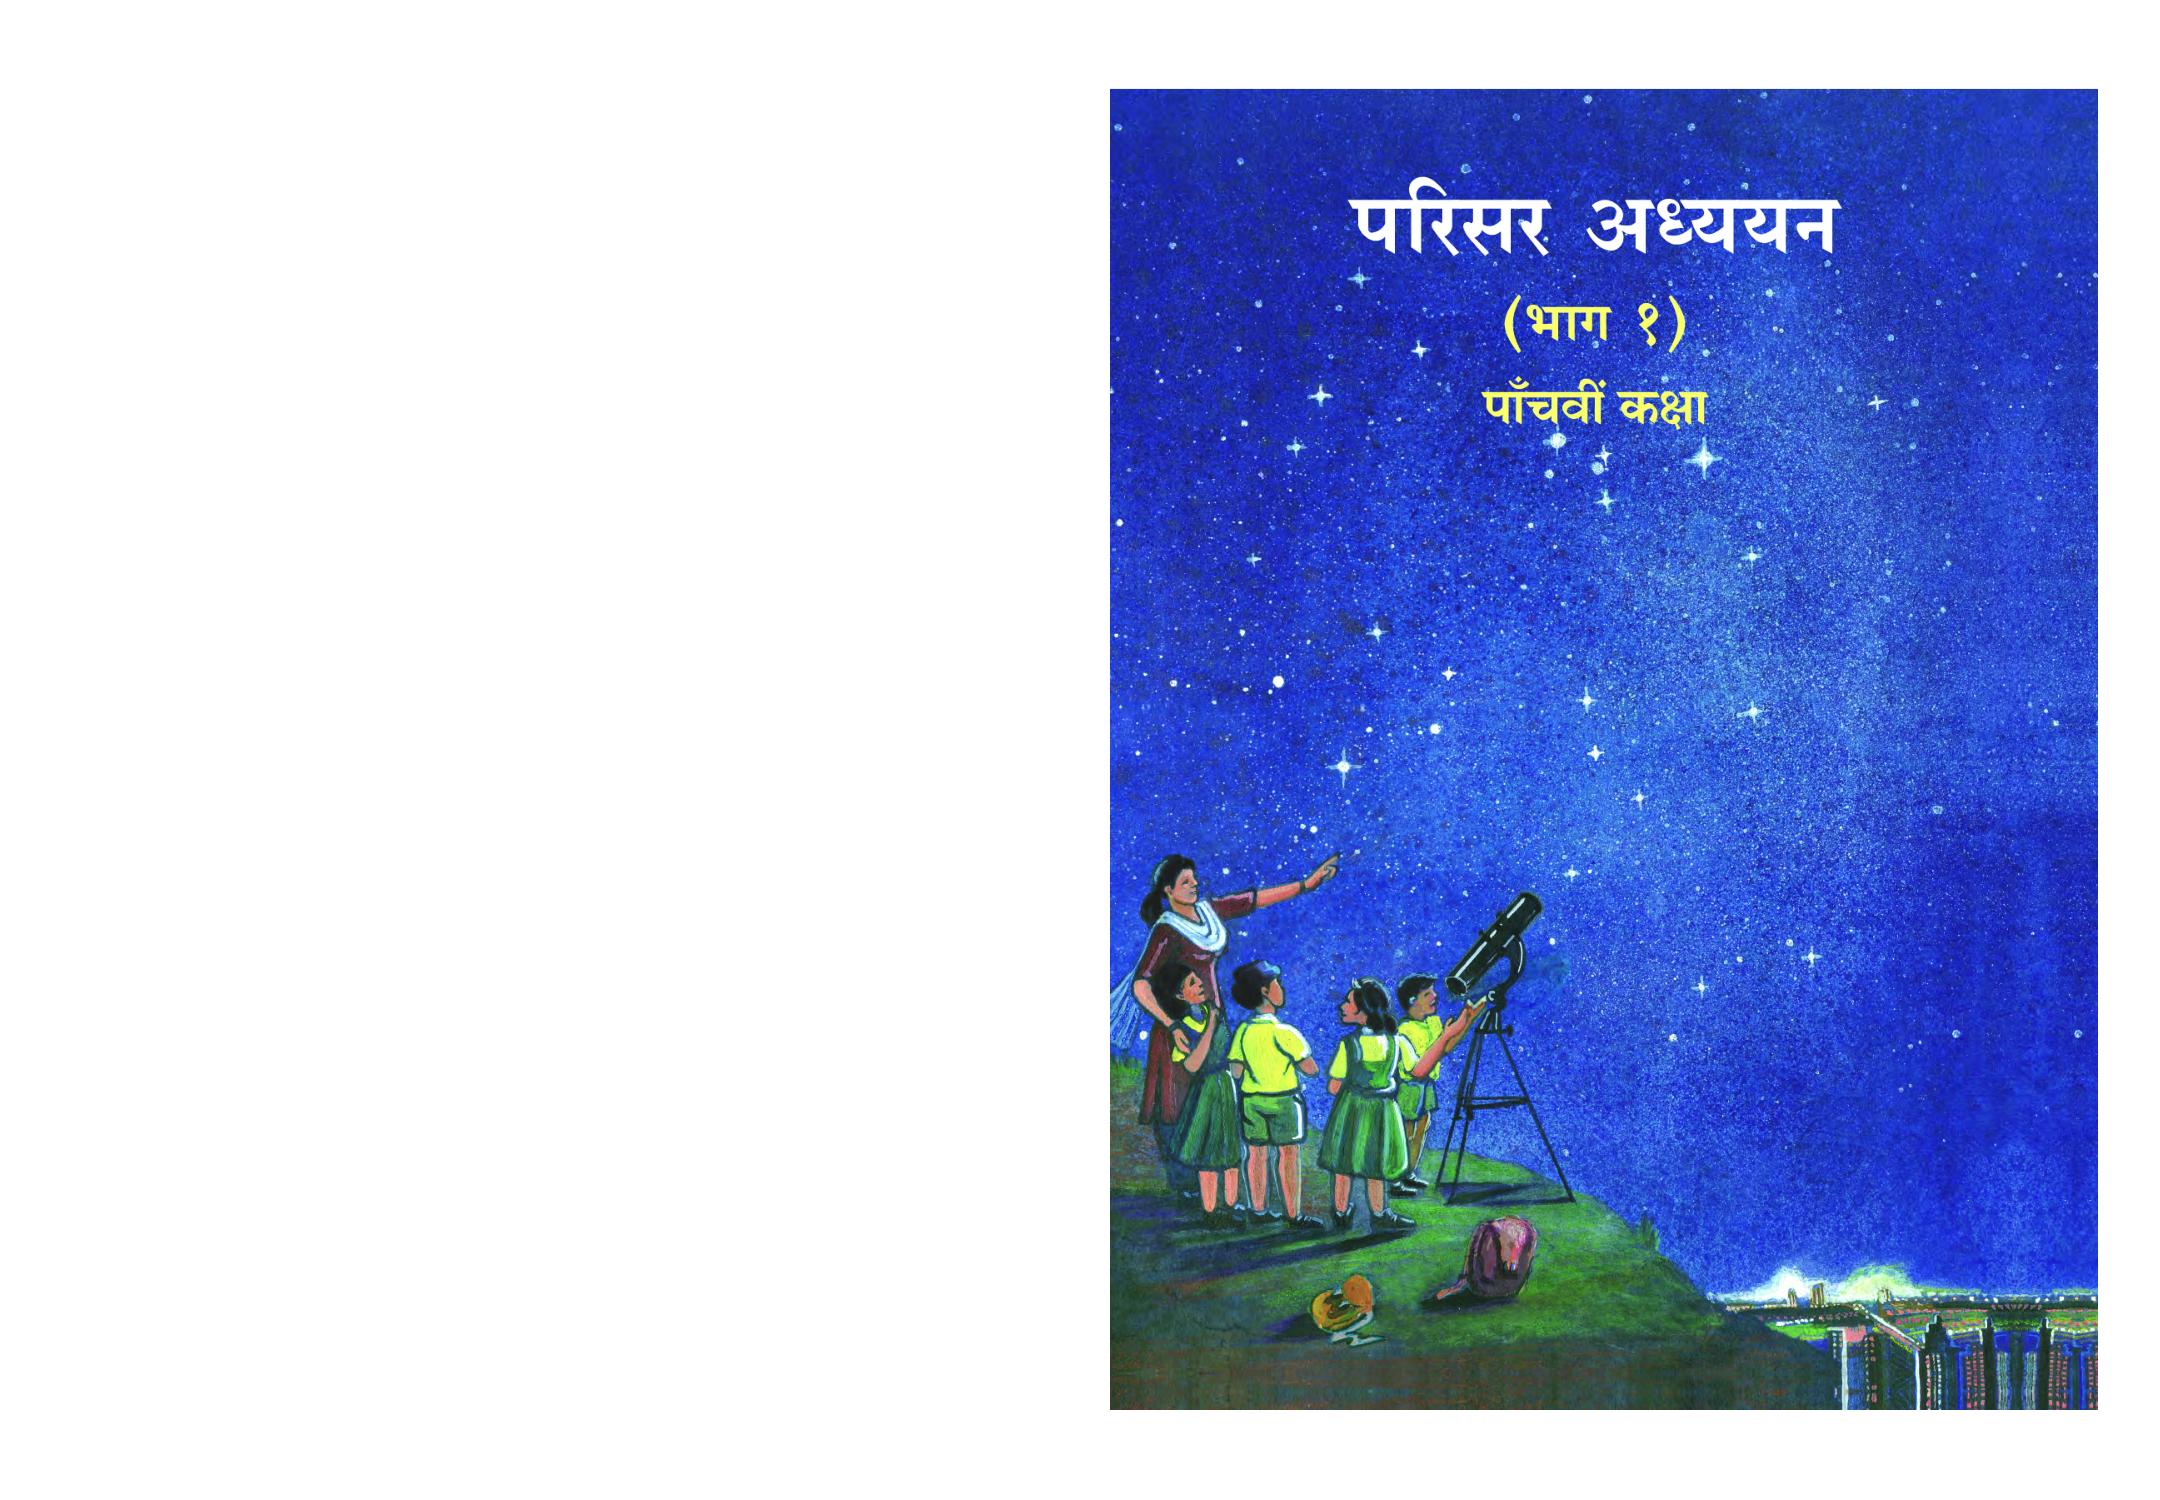 Maharashtra School Textbook परिसर अध्ययन (भाग-१) For Class-5 - Page 1